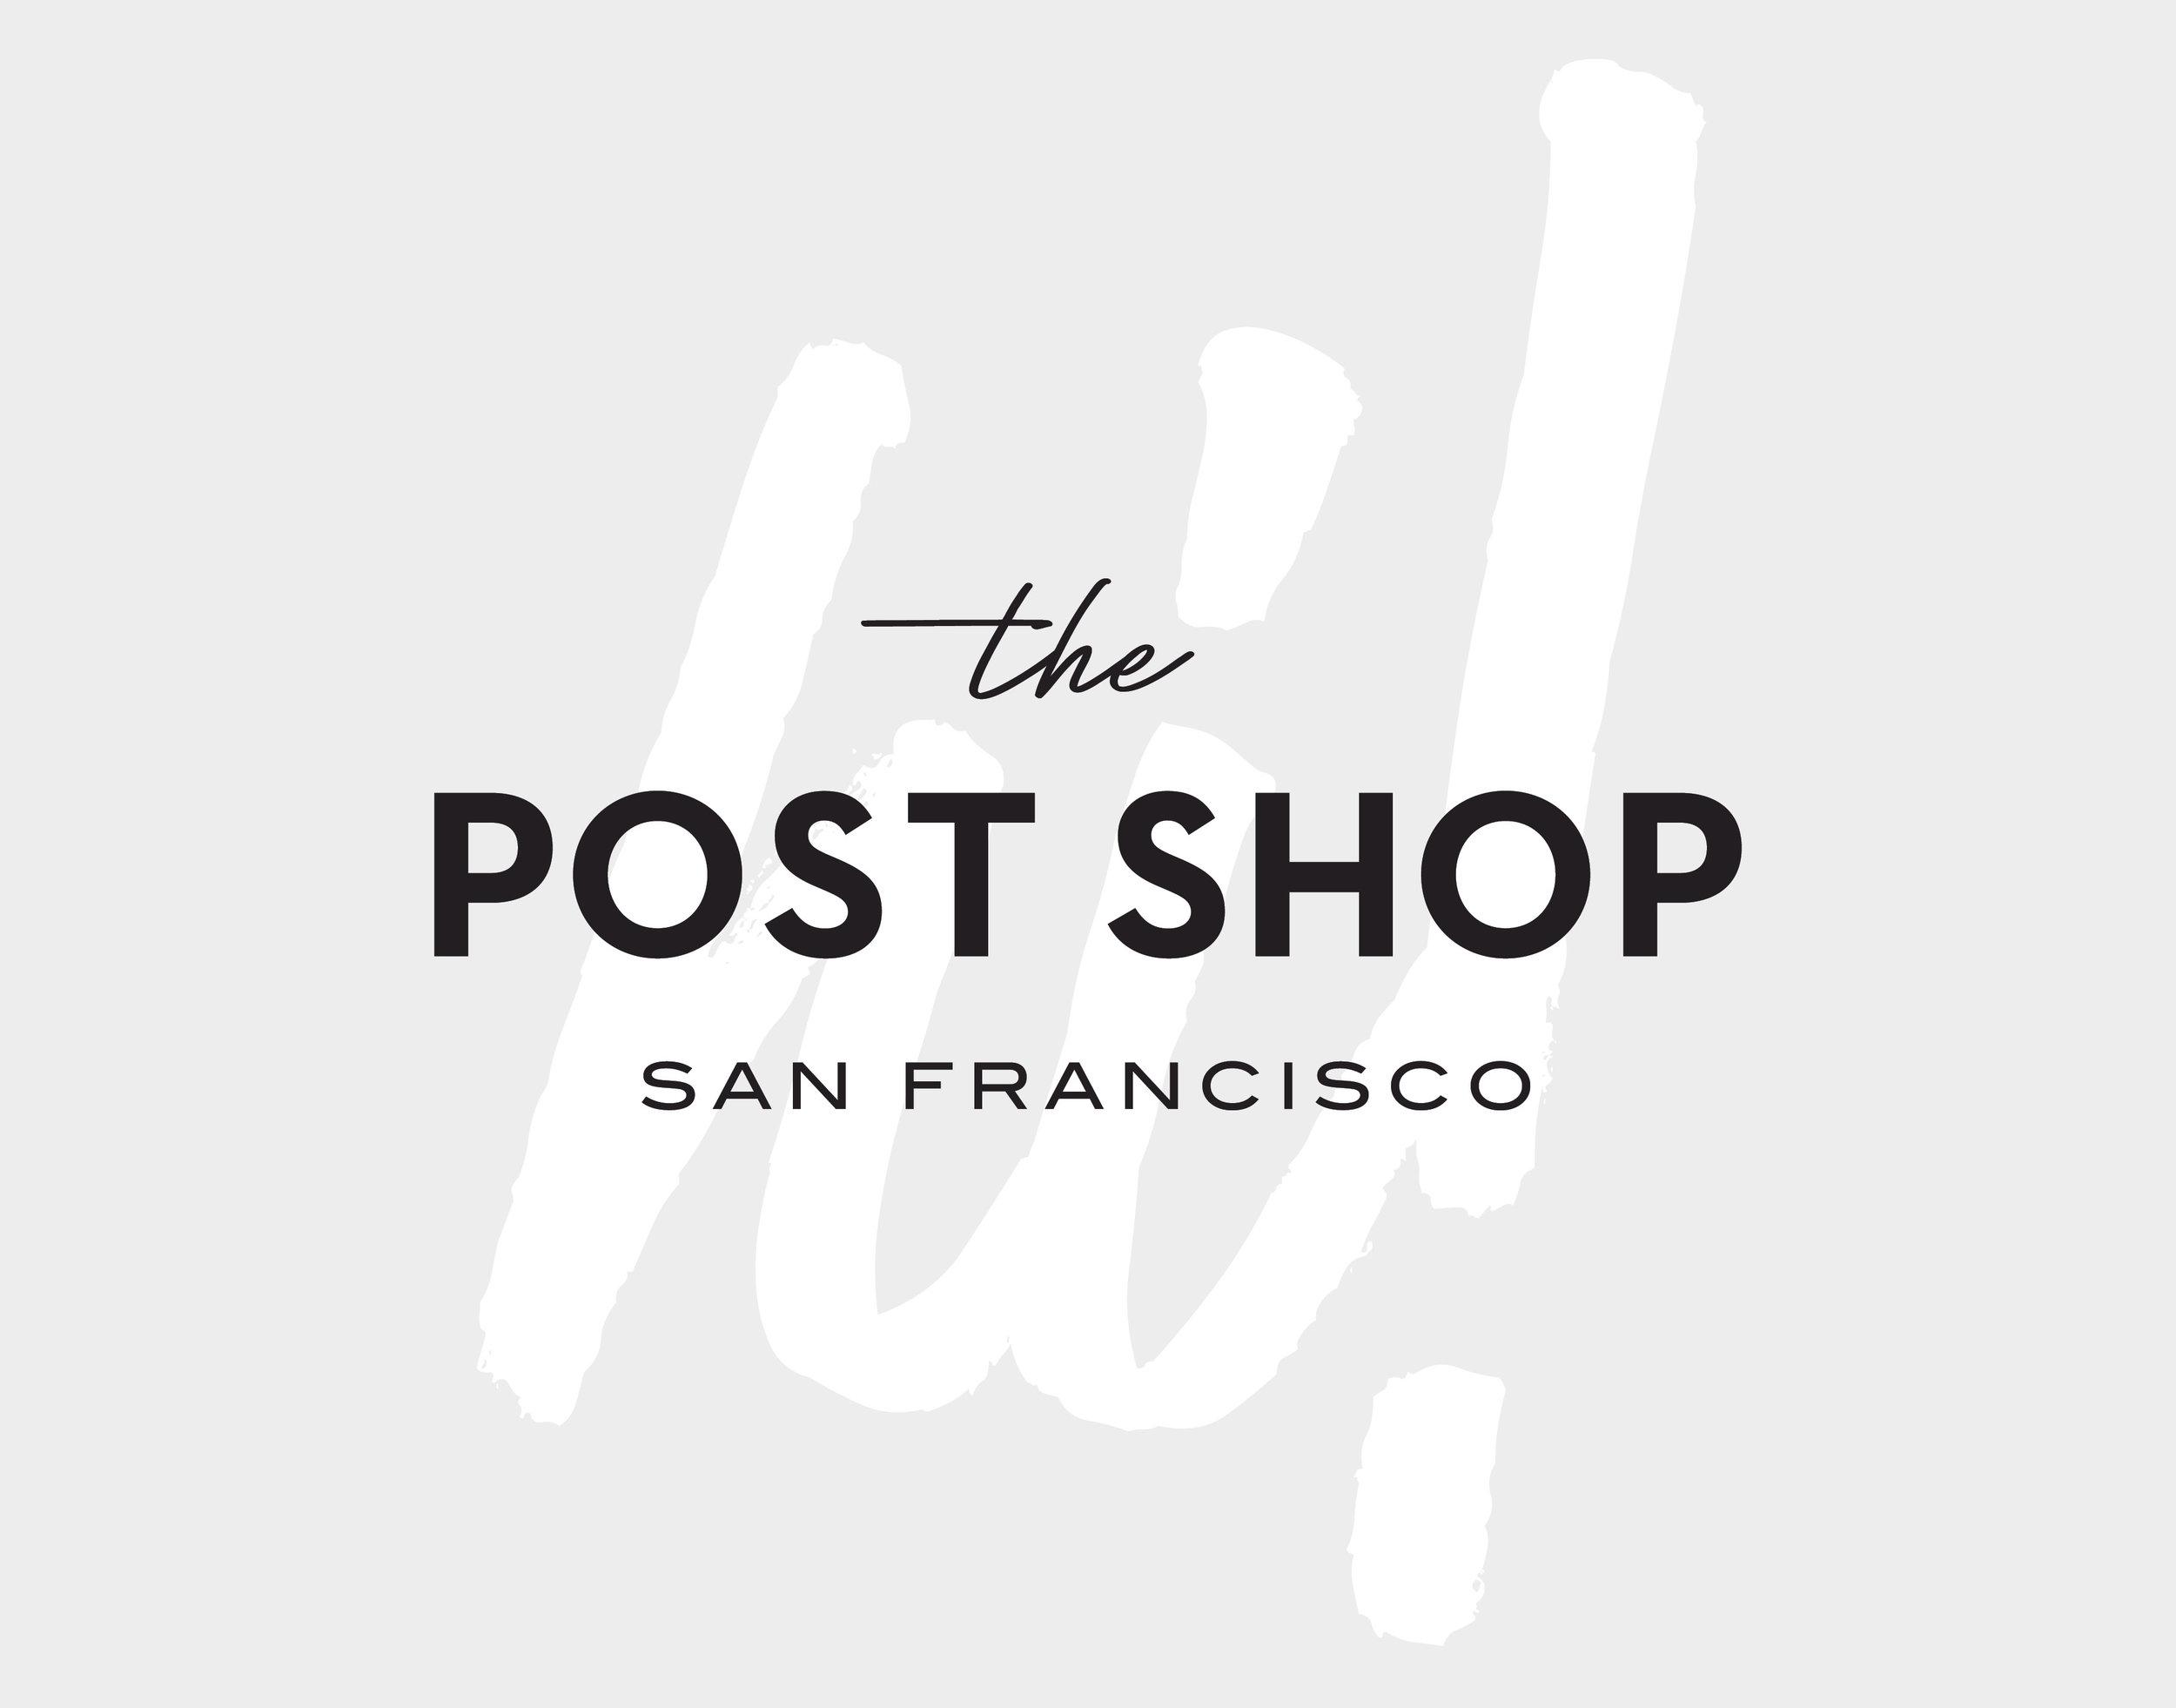 PostShop_Book_TPS_Edits_07022019_WebBrandbook.jpg